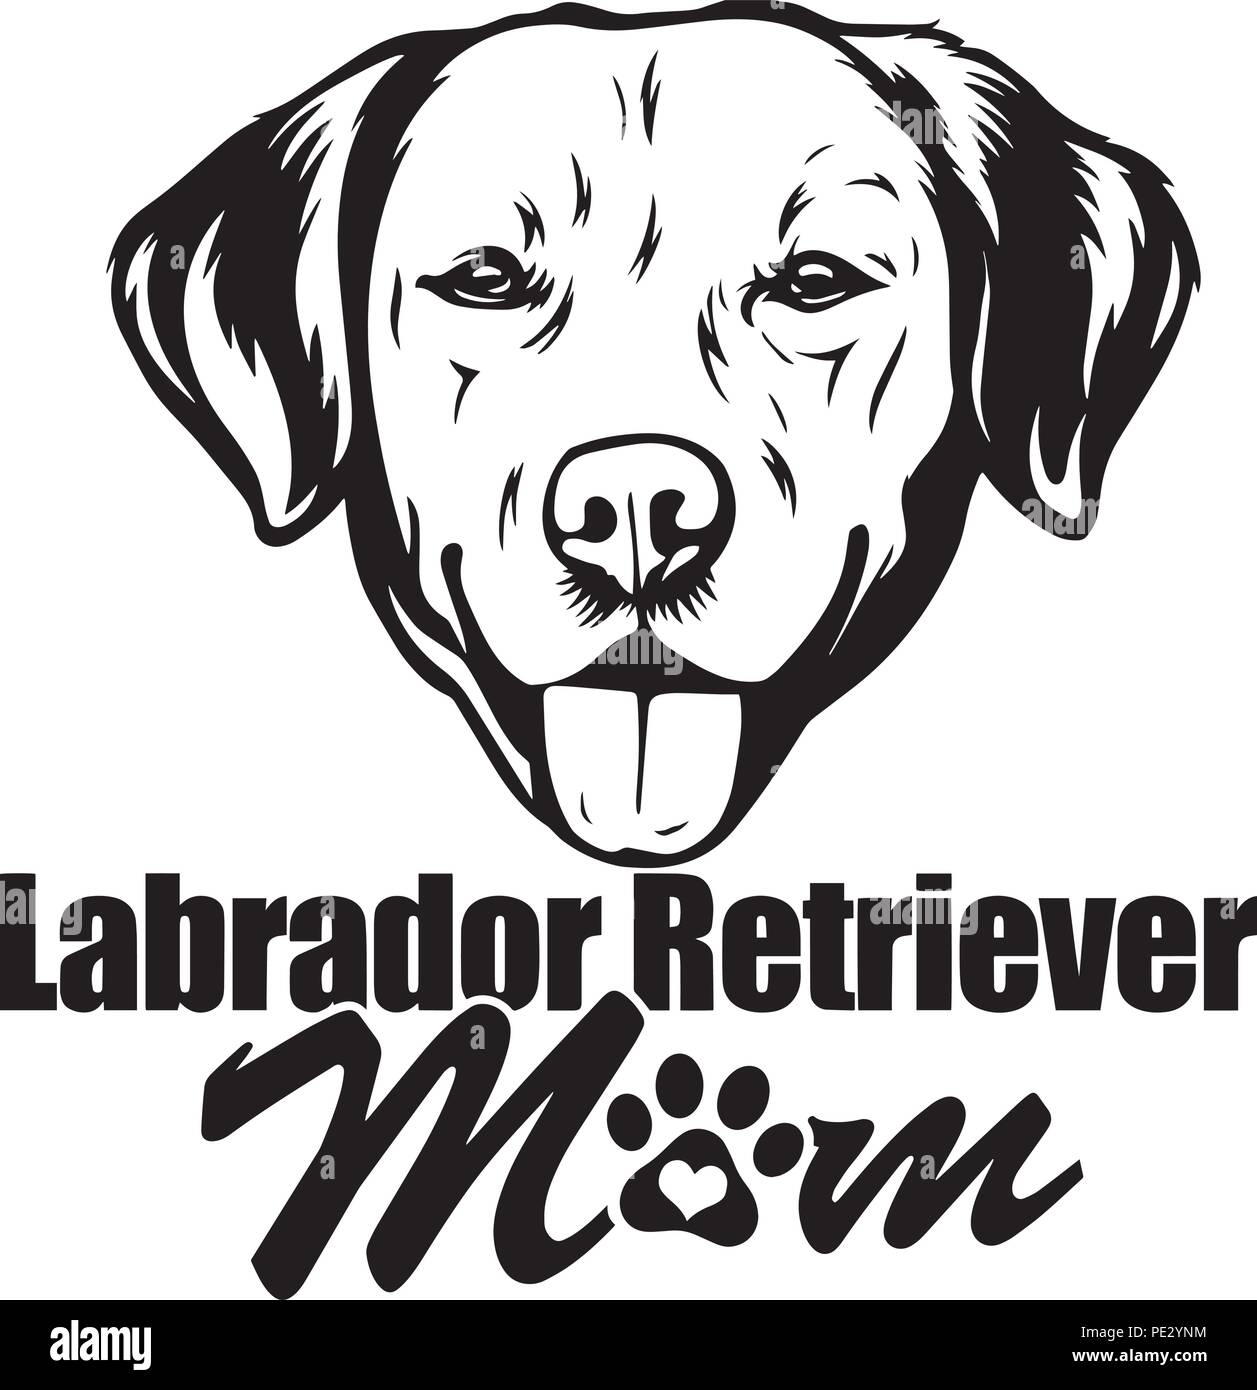 Labrador Retriever Dog Breed Pet Puppy Isolated Head Face Stock Vector